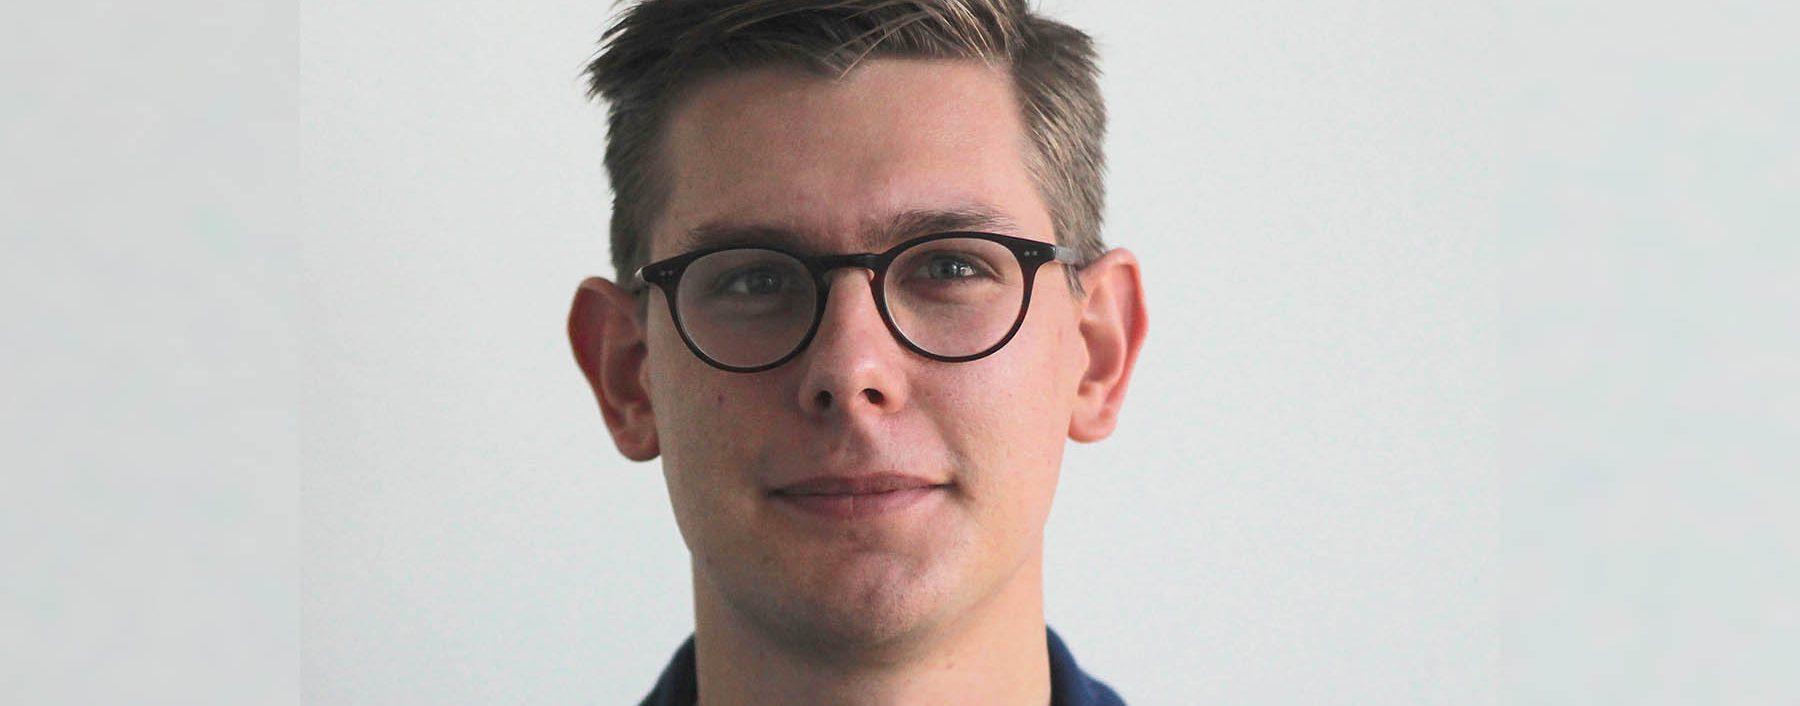 Nimmt am 28. Februar an unserem Panel auf der Social Media Week Hamburg teil: Johannes Klingebiel.